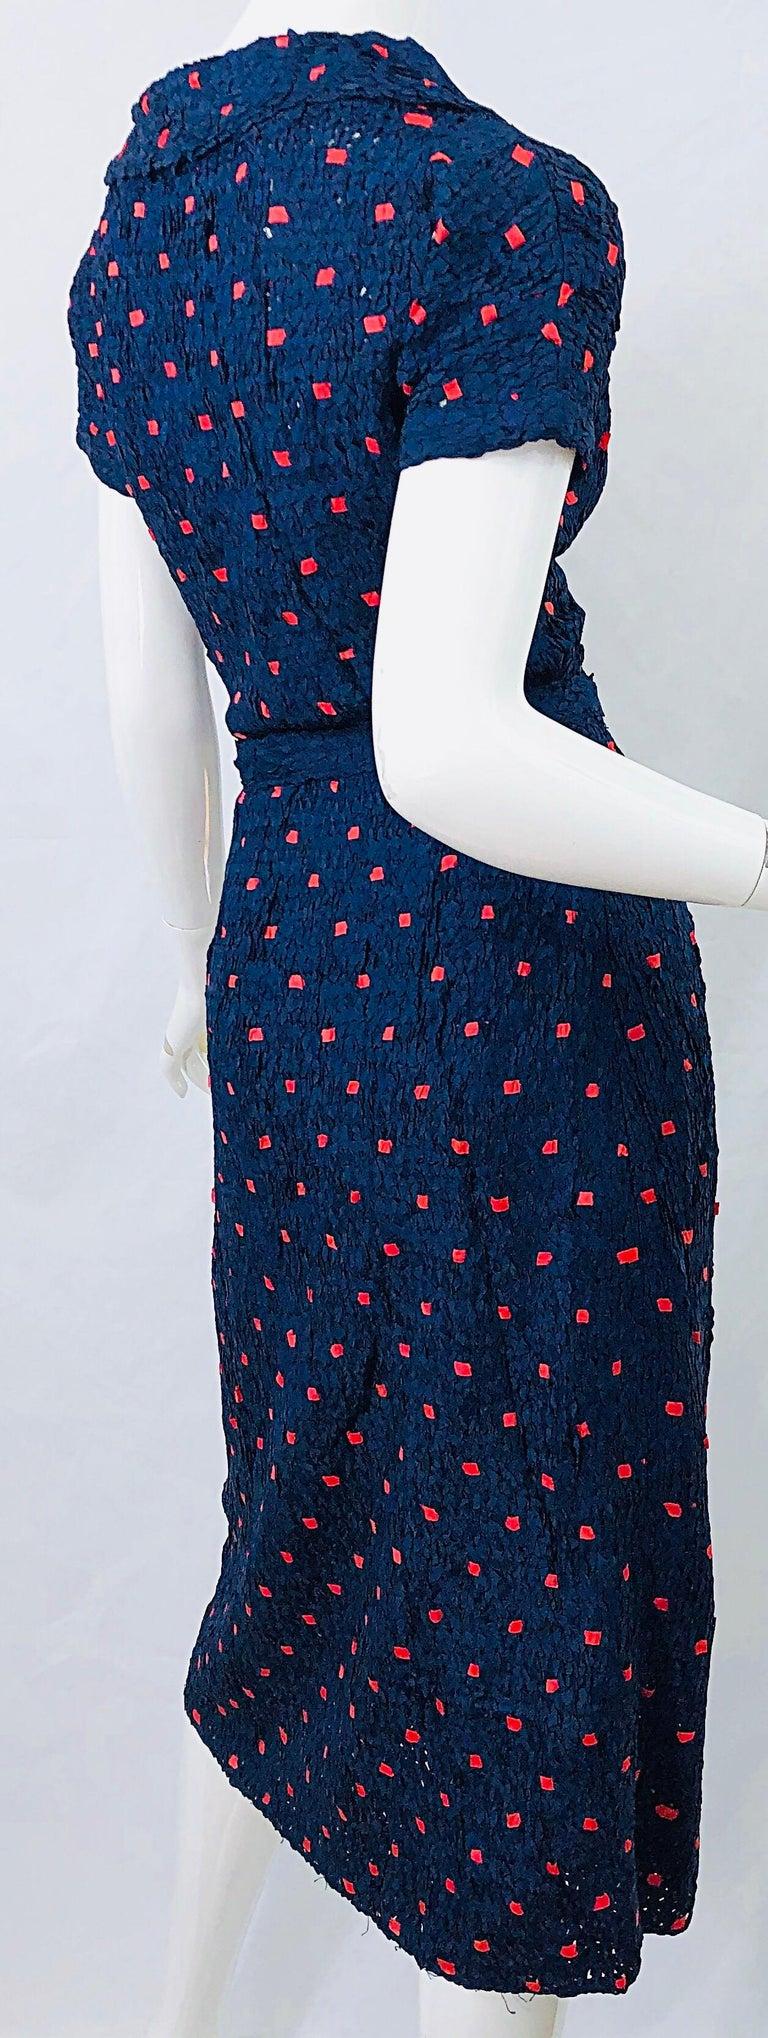 1950s Ann Fleischer for I Magnin Hand Ribbon Knit Navy Blue + Red Vintage Dress For Sale 6